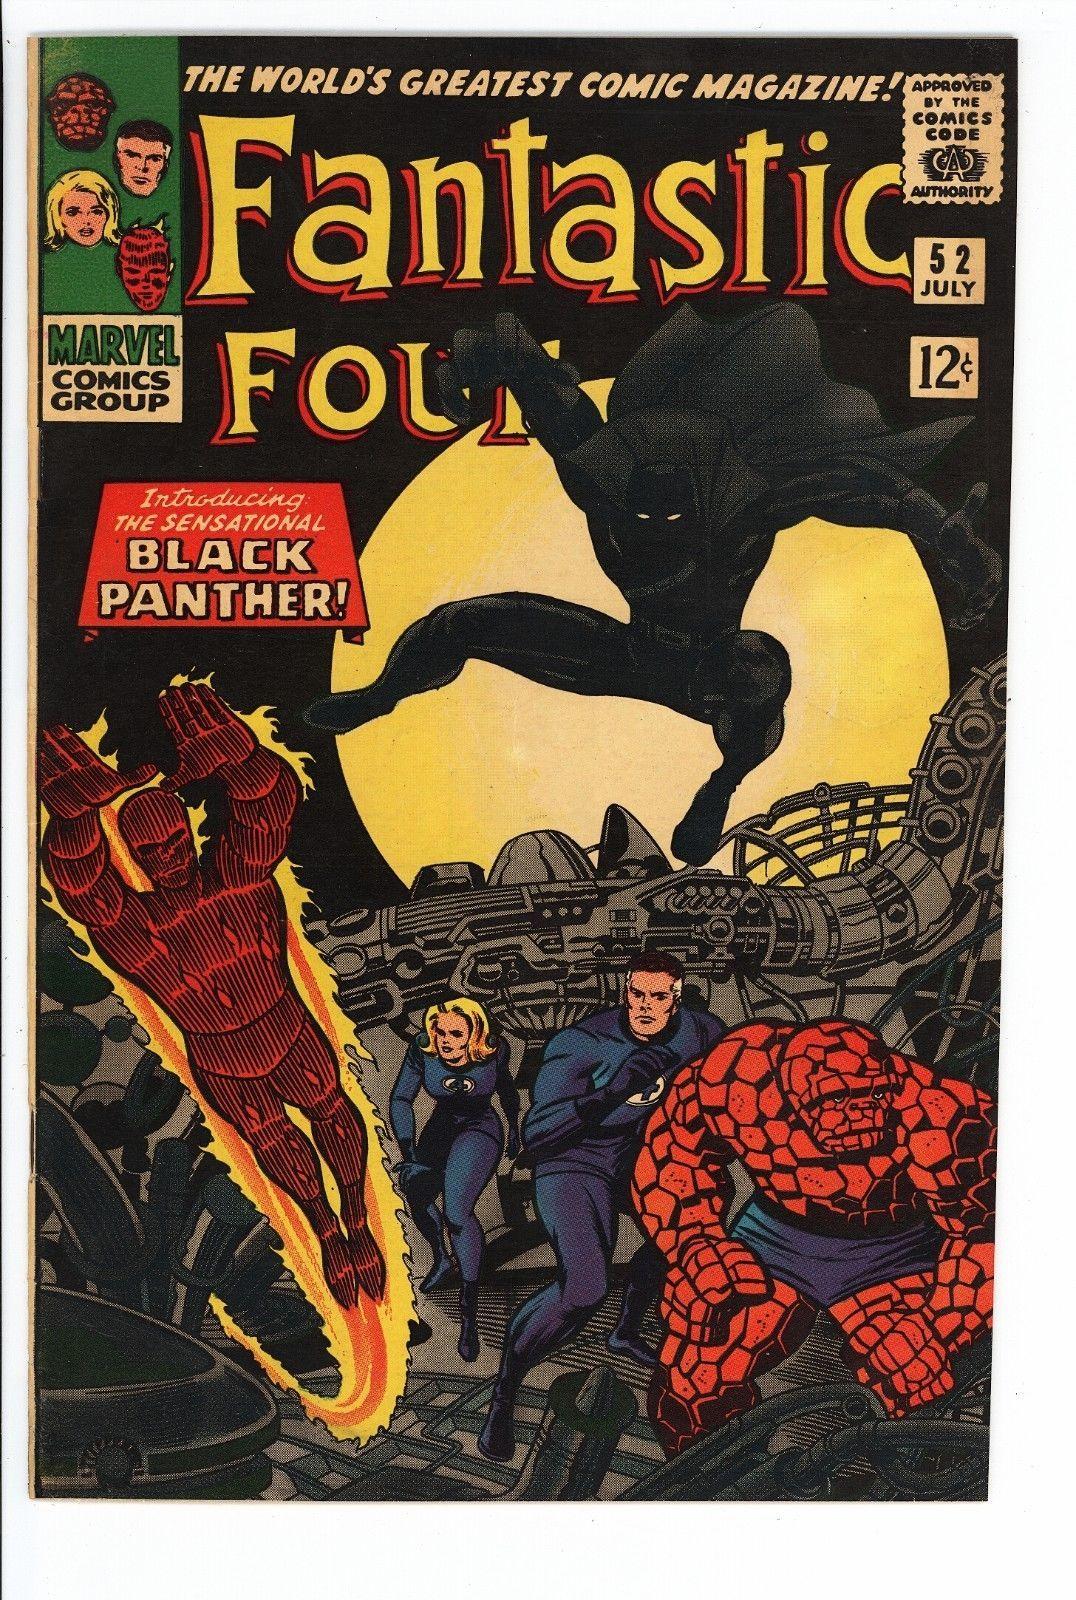 archived! $ 355   Fantastic Four #52 Vol 1 High Grade 1st Appearance . #comics #FantasticFour https://t.co/E7M0vPaugl